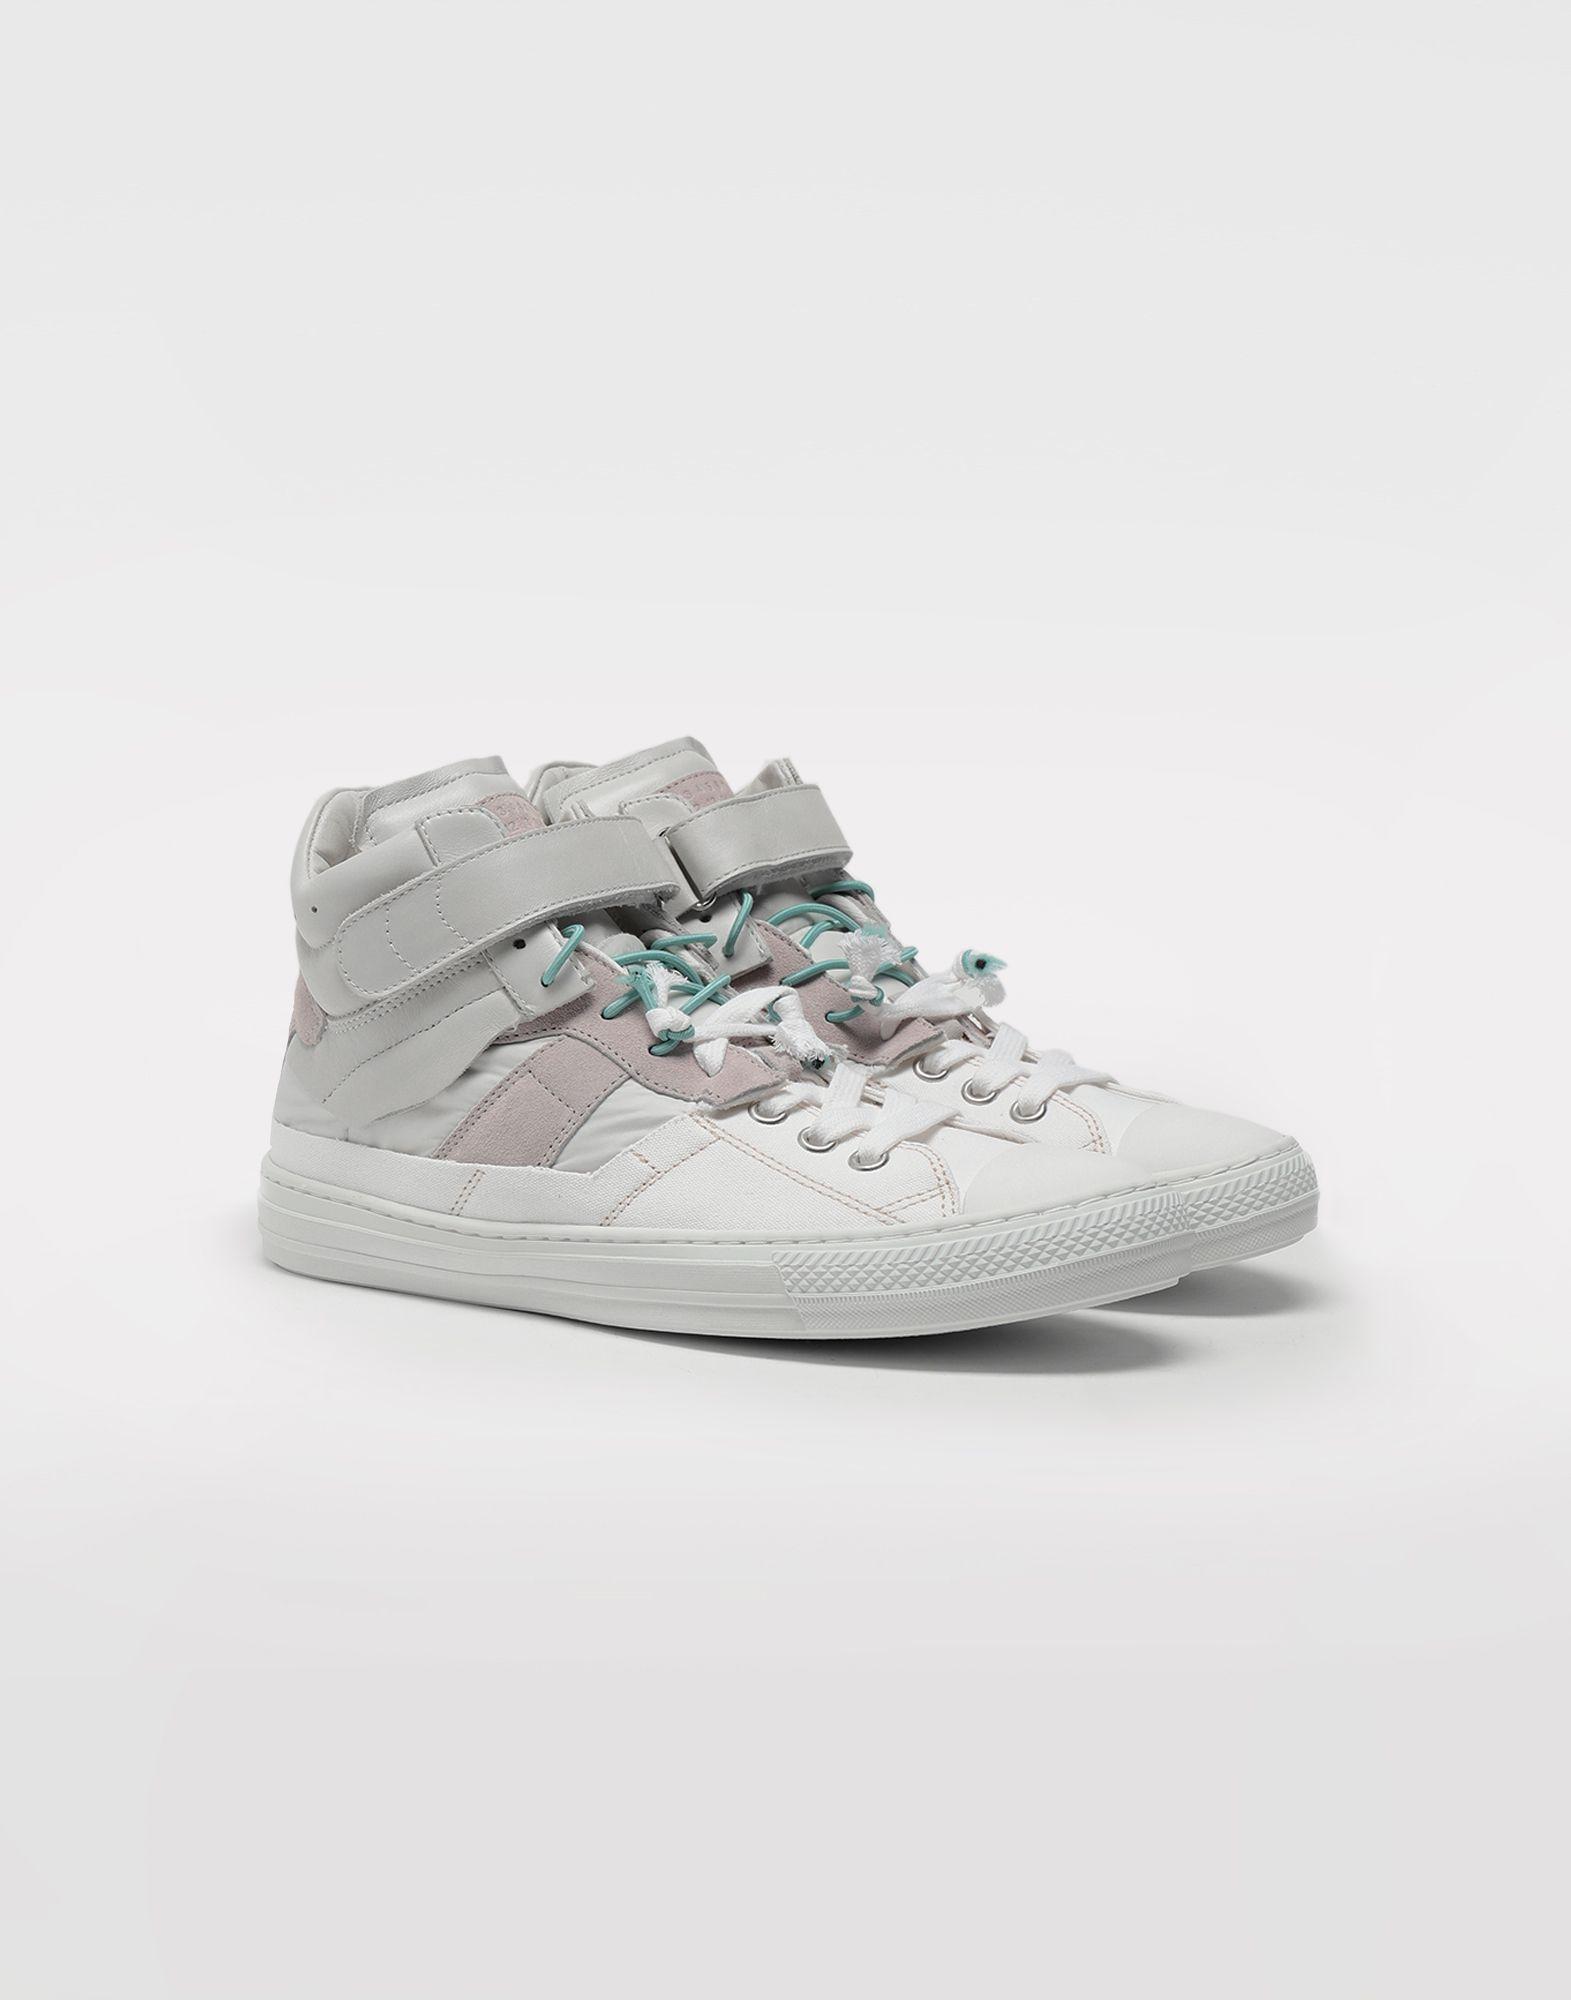 MAISON MARGIELA Sneakers montantes Spliced Sneakers Homme r